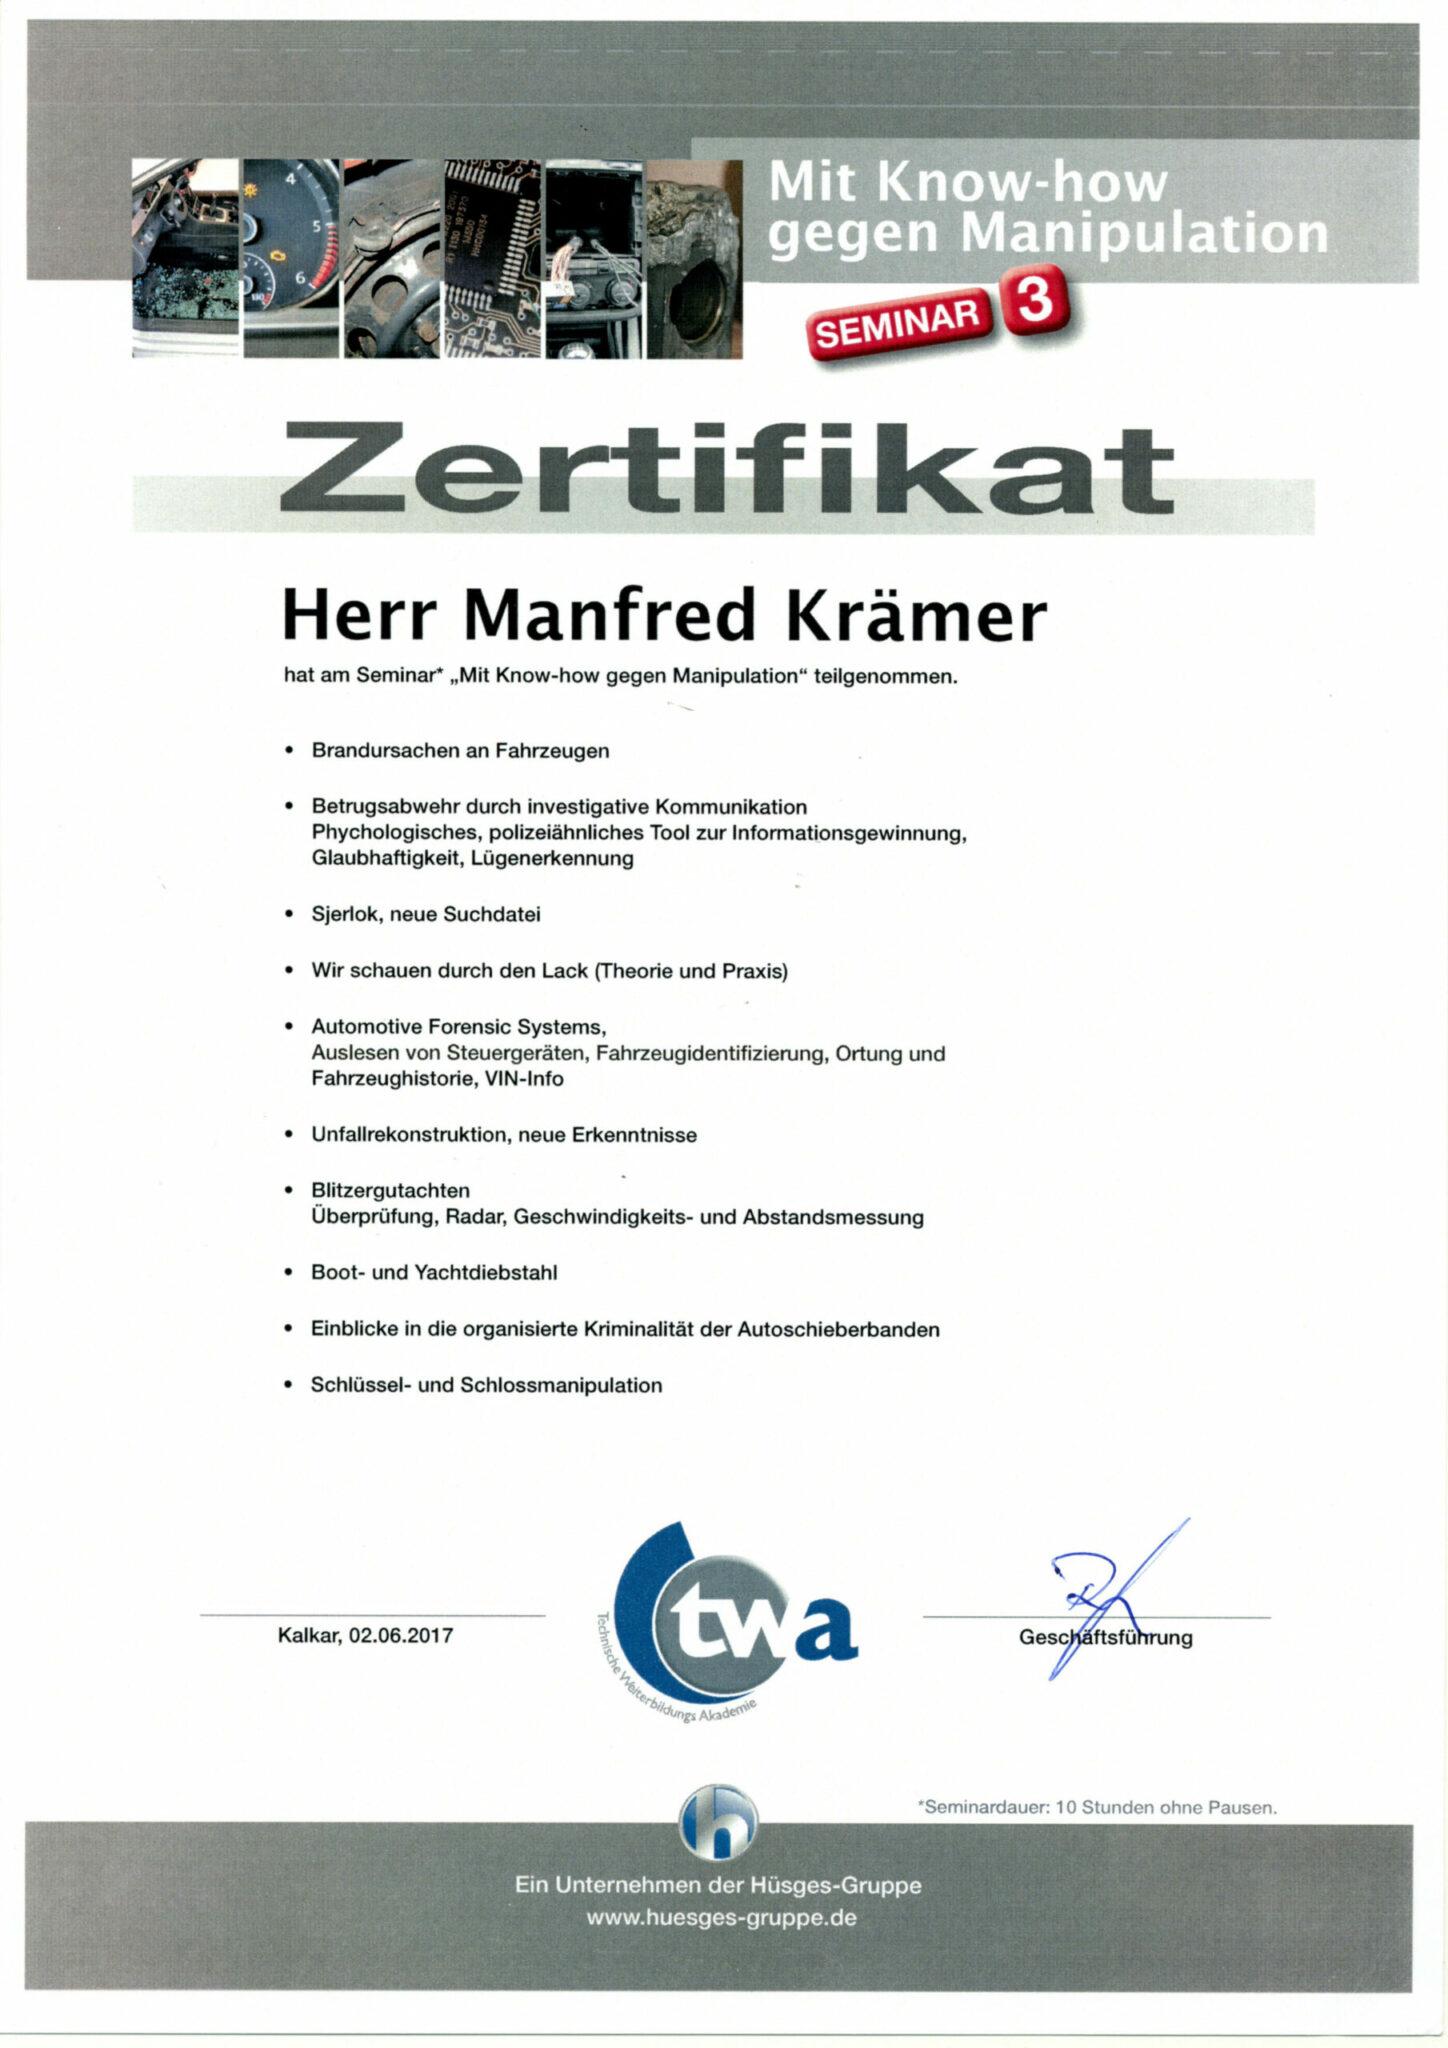 Hüsges Zertifikat 2017